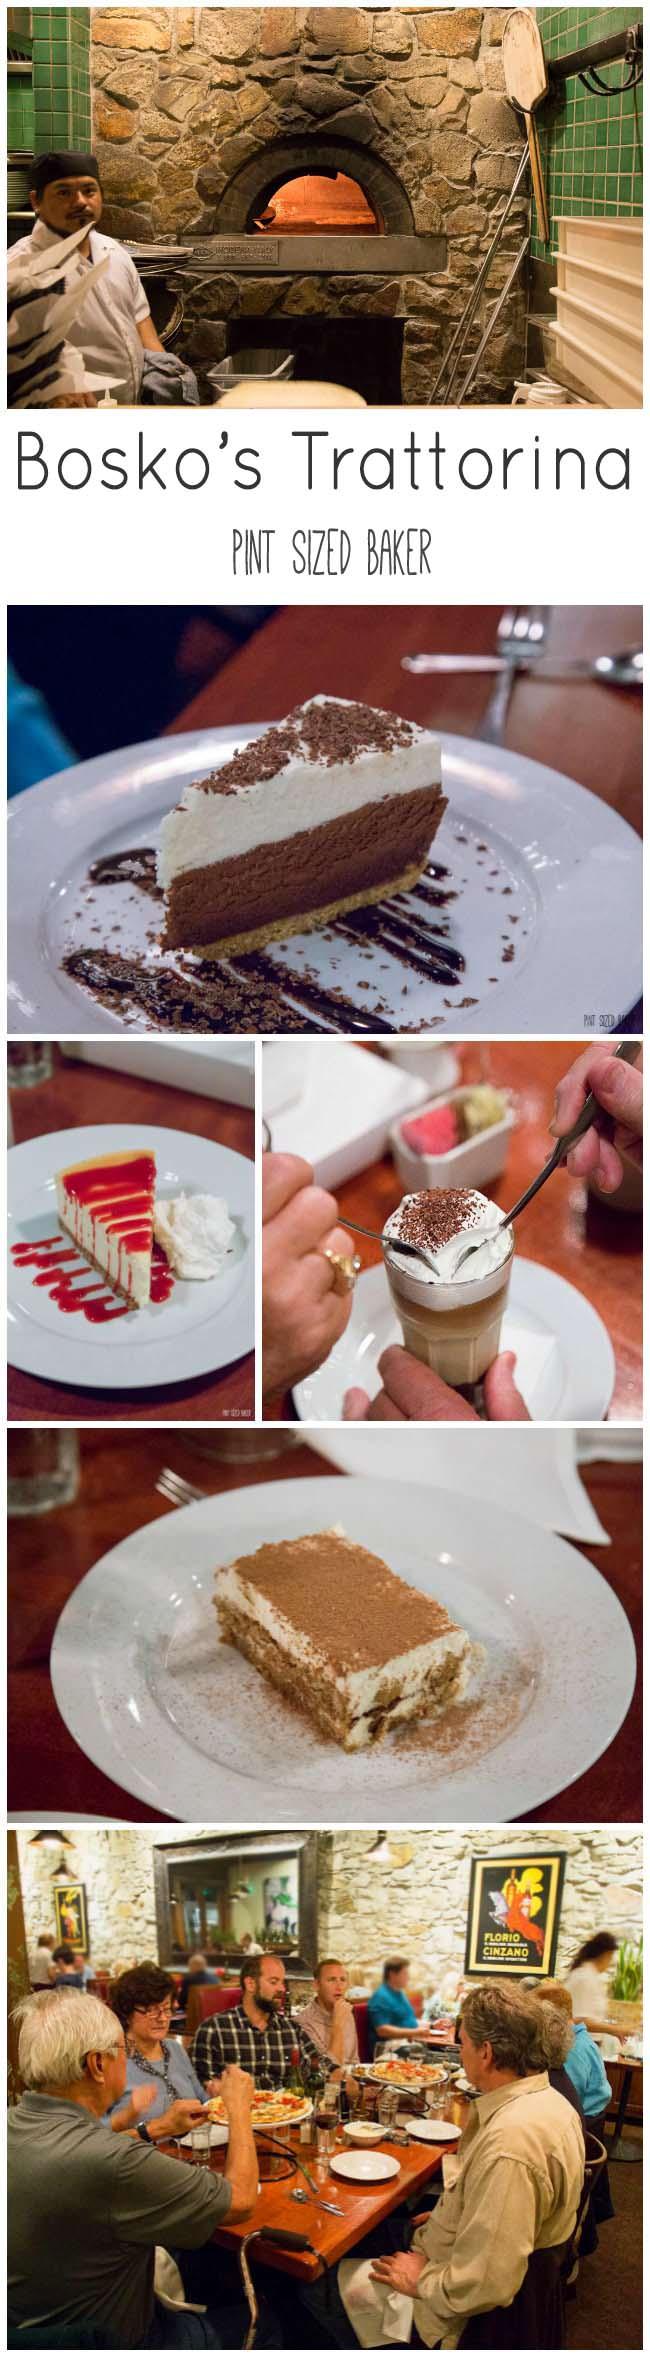 Visit Bosko's Trattorina in Calistoga, California for a great Italian dinner and amazing desserts!